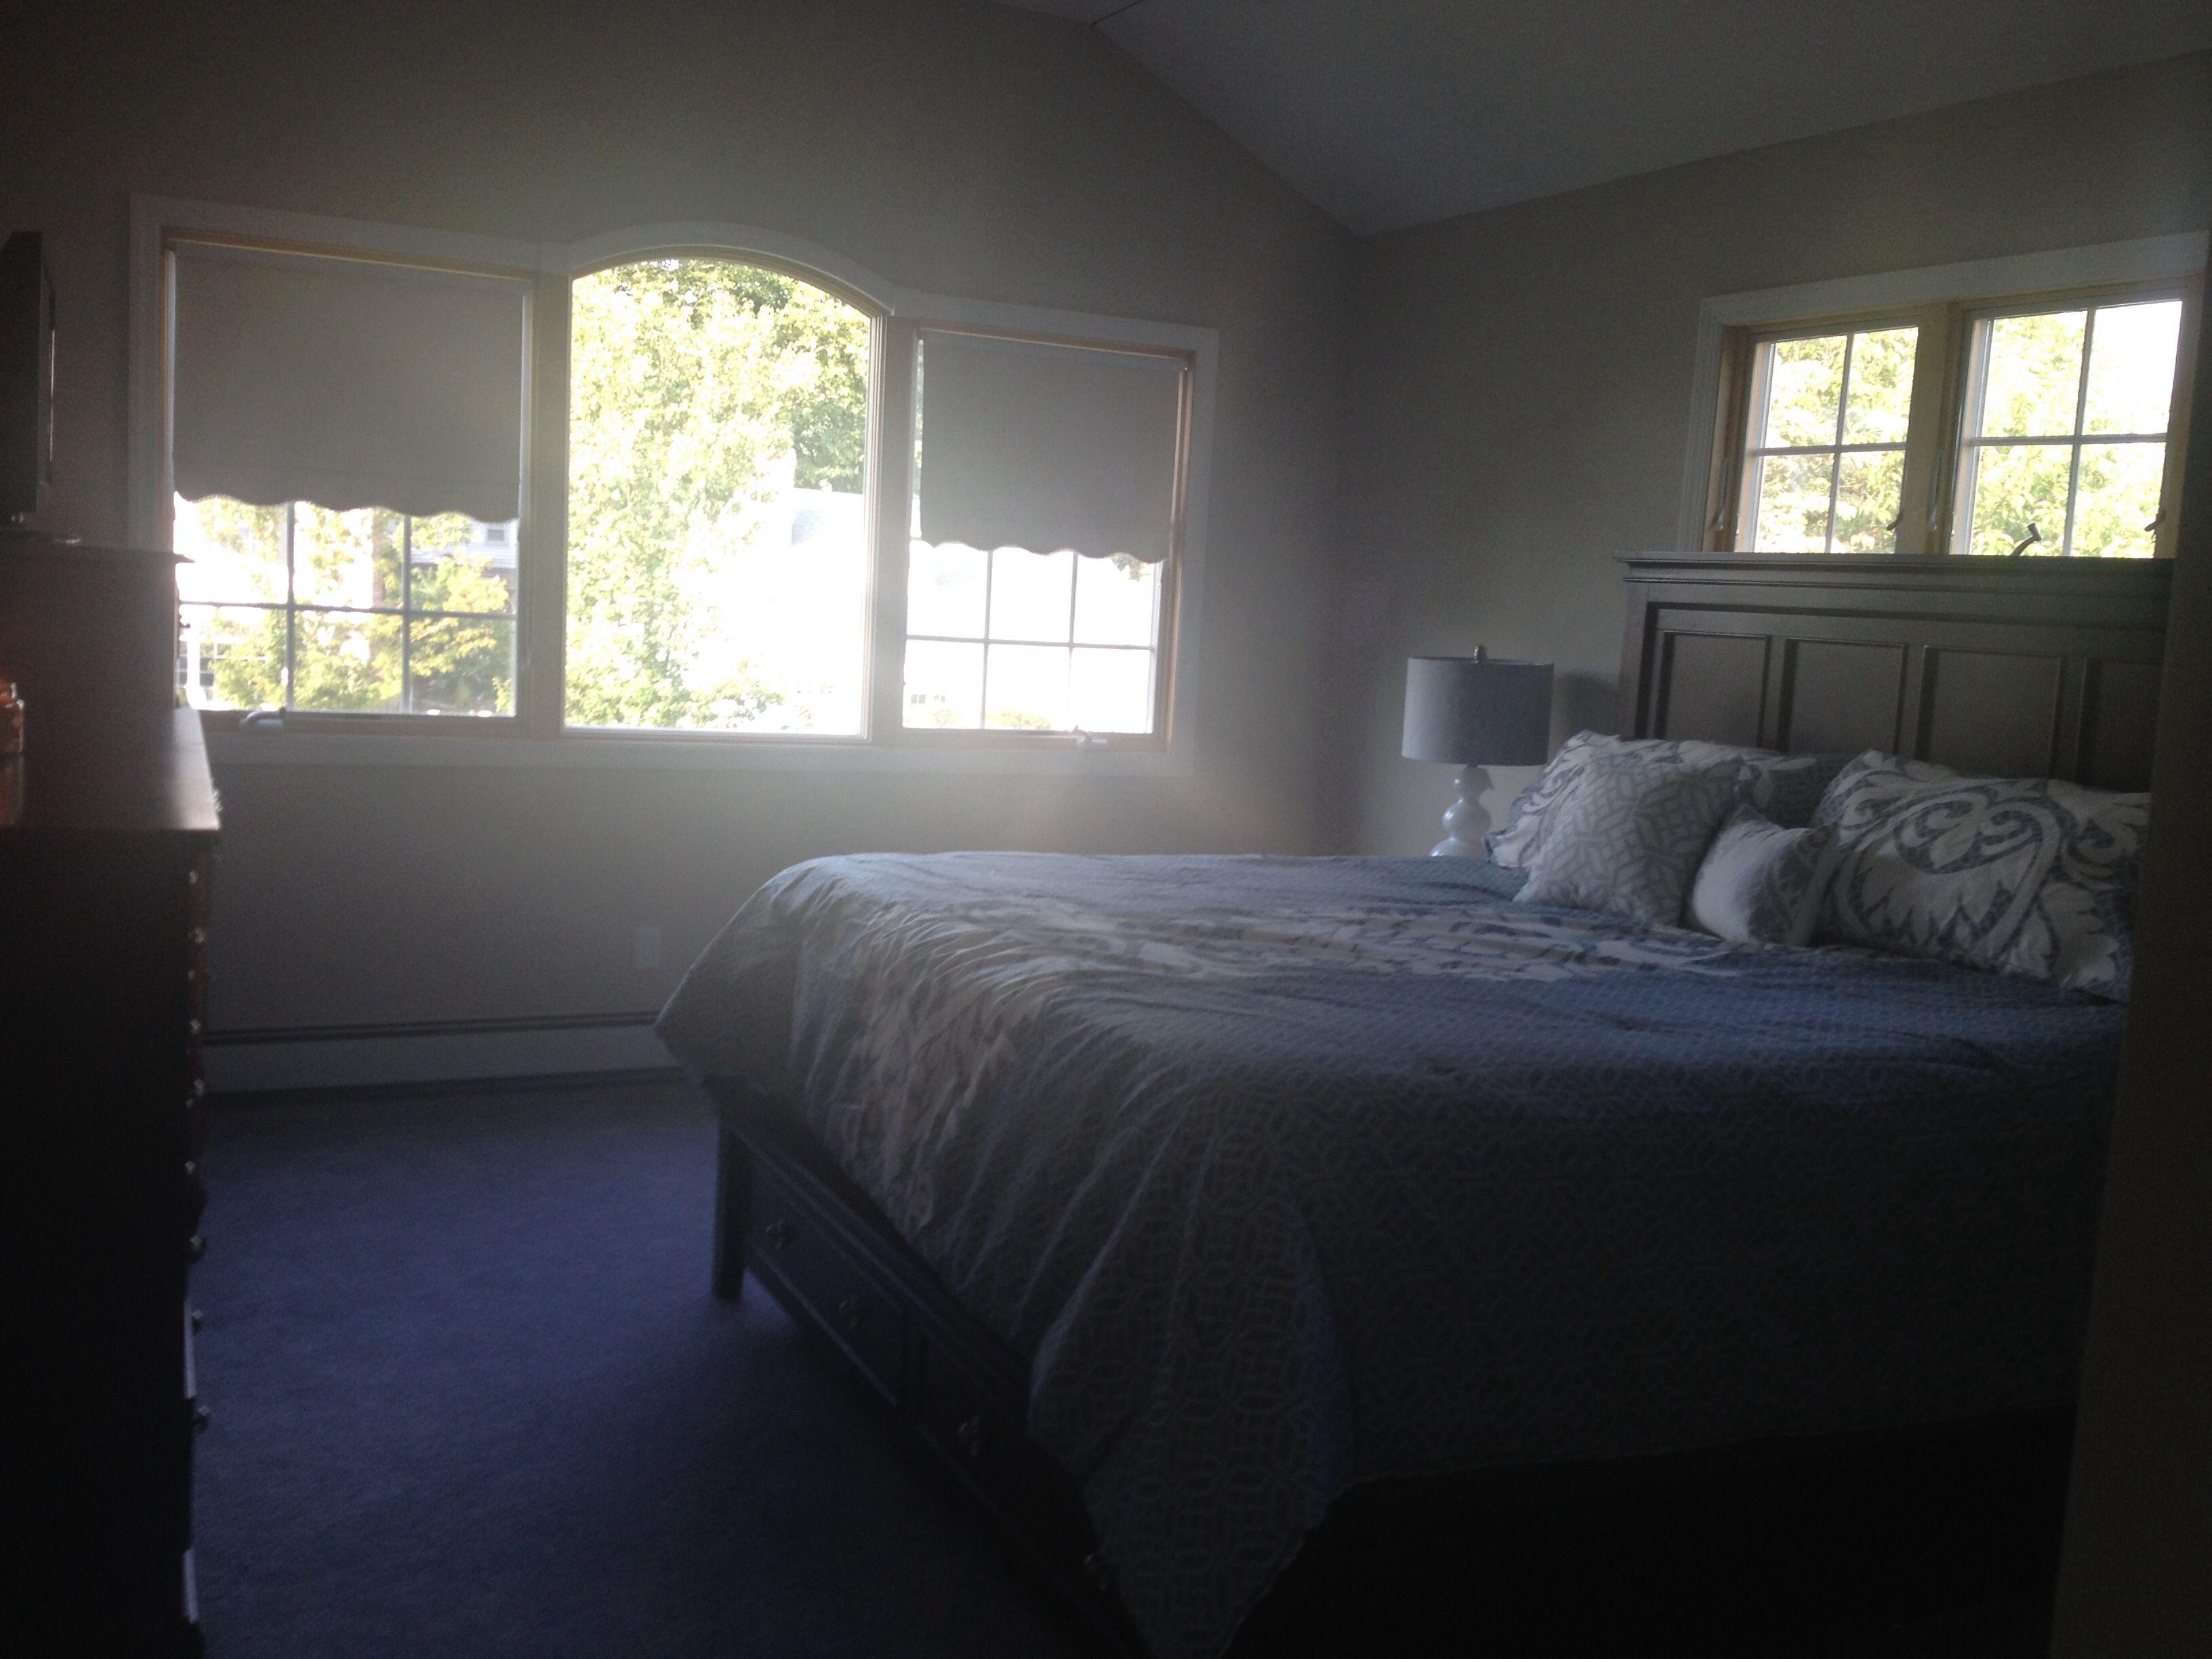 revere pewter benjamin moore daylight master bedroom